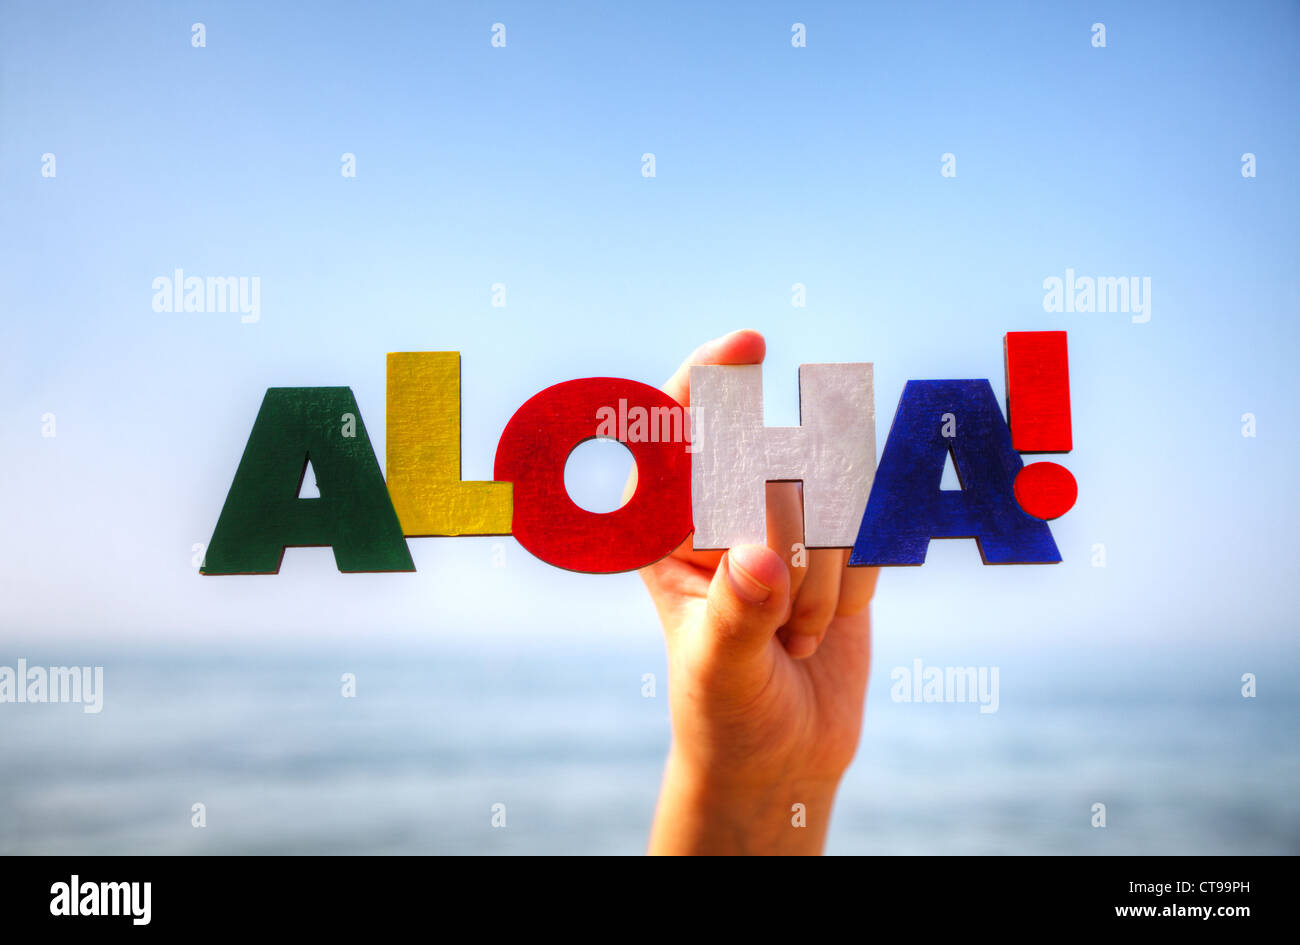 Femme's hand holding colorful mot 'Aloha' contre fond bleu Photo Stock